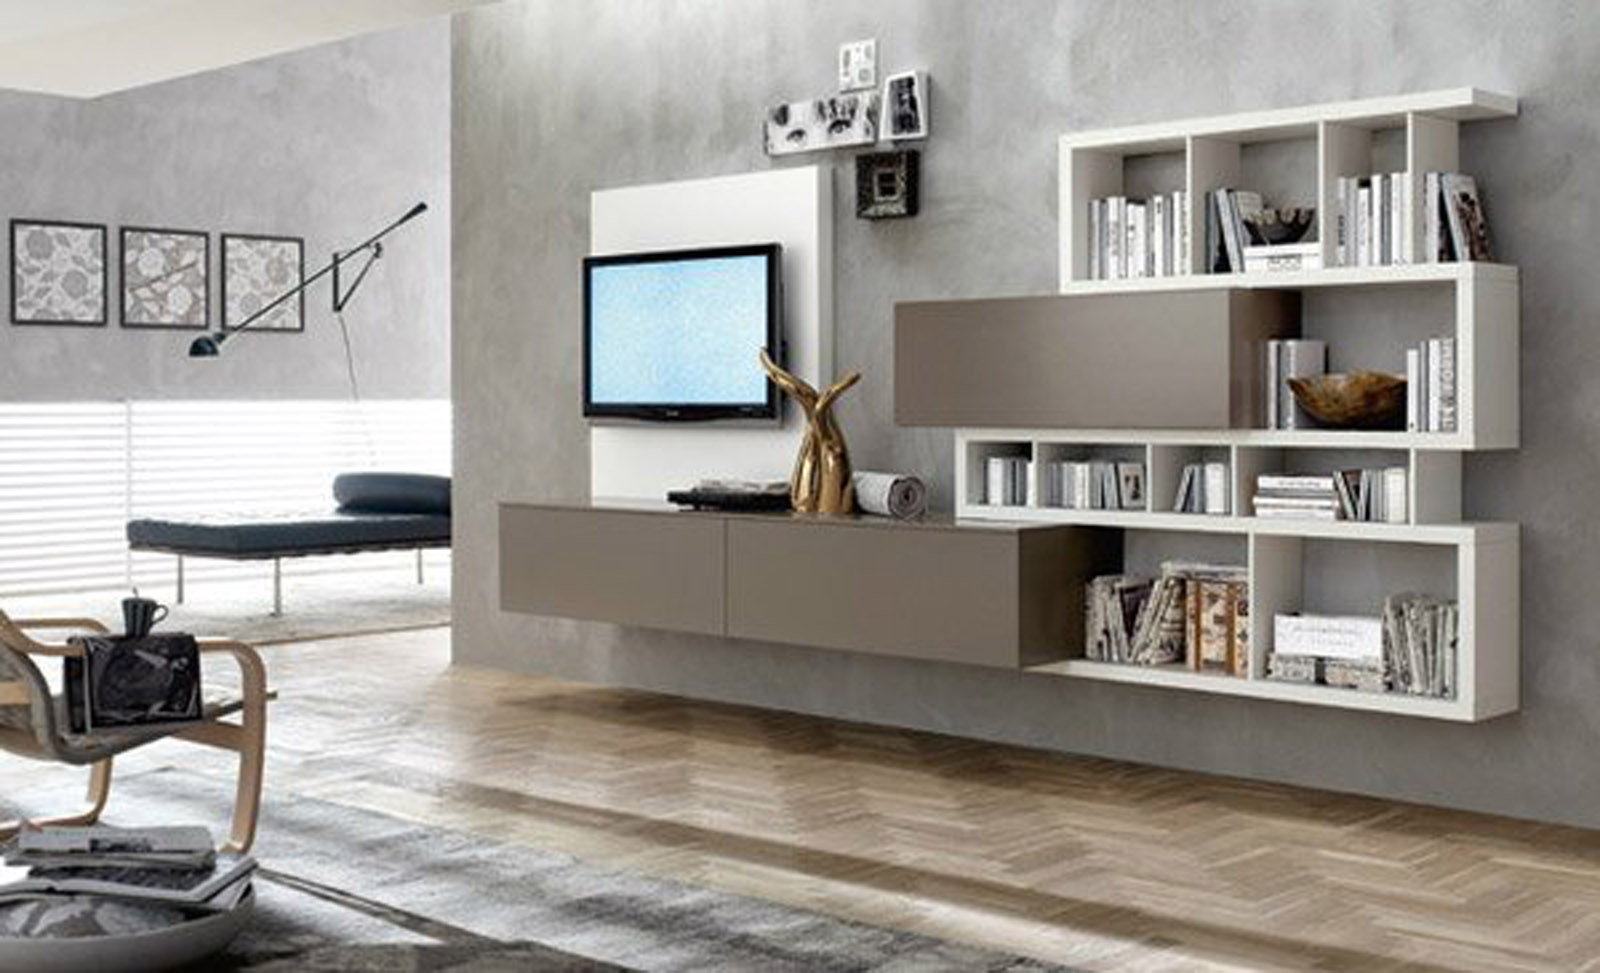 Consigli Arredamento Casa Excellent Arredare Casa Guide